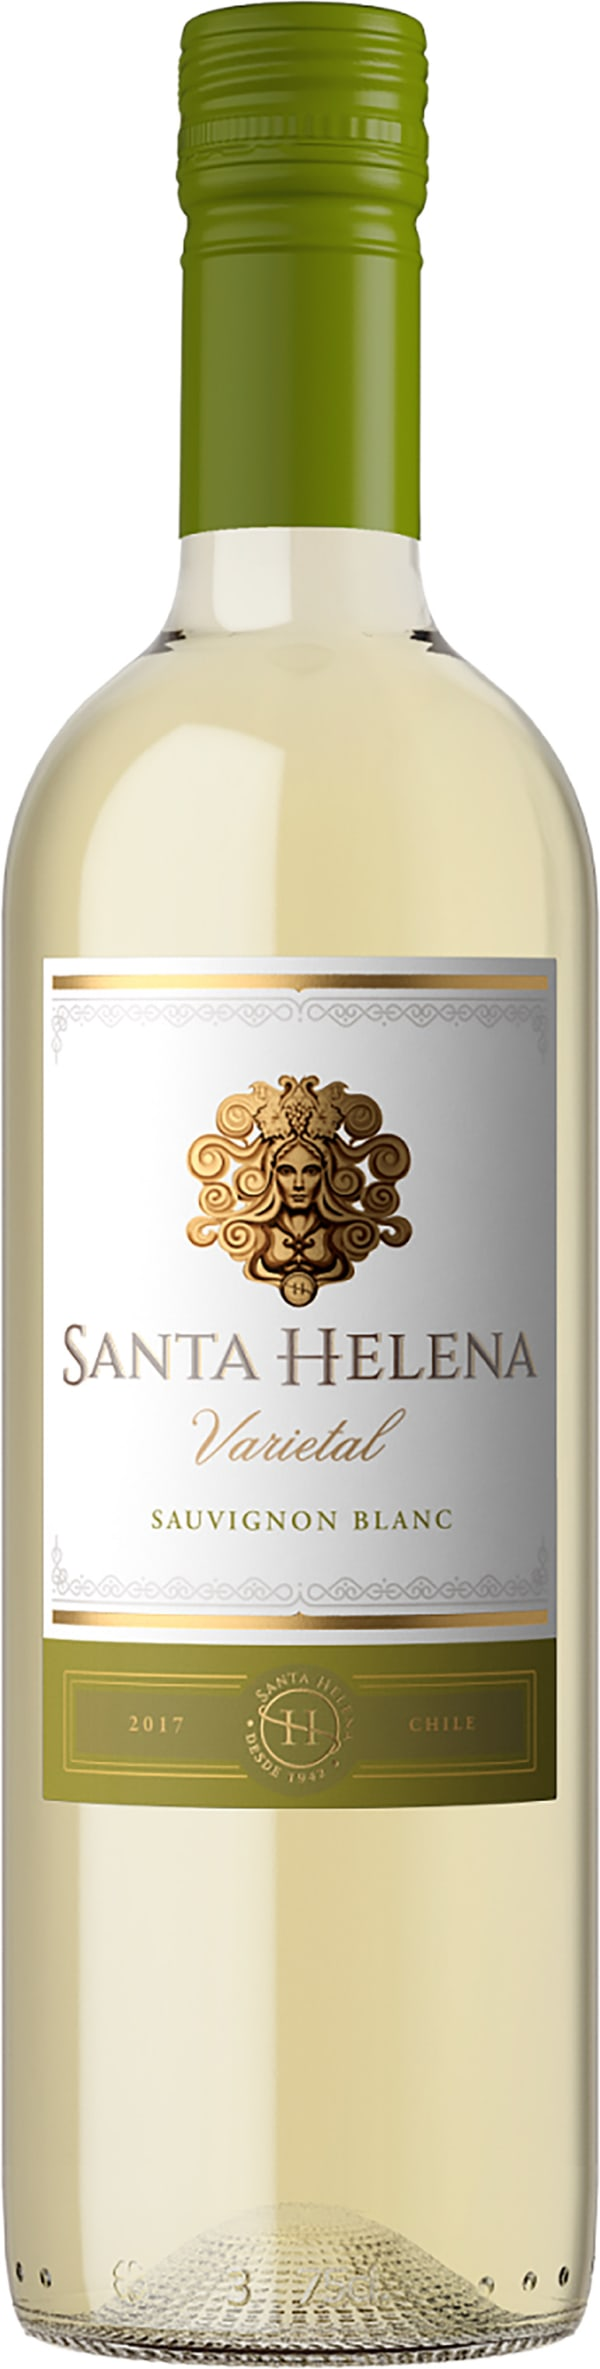 Santa Helena Varietal Sauvignon Blanc 2017